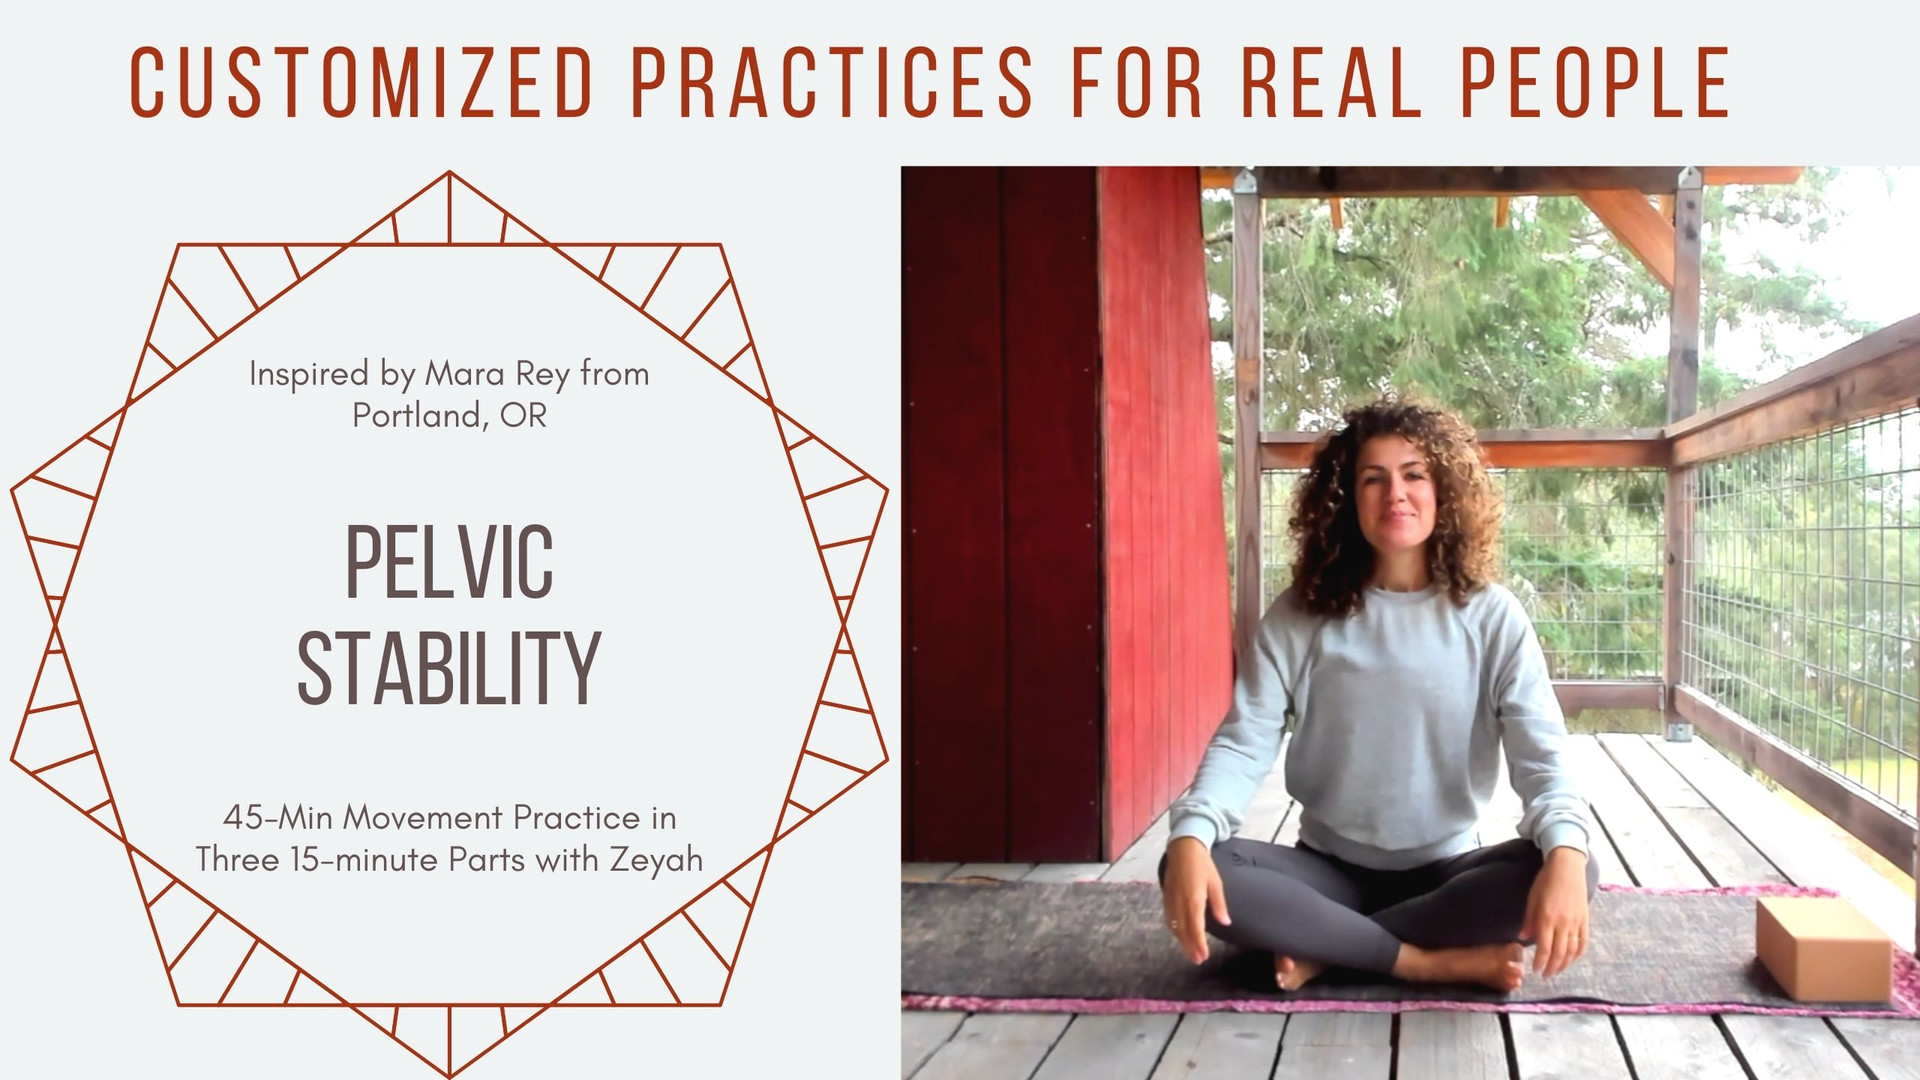 Pelvic Stability